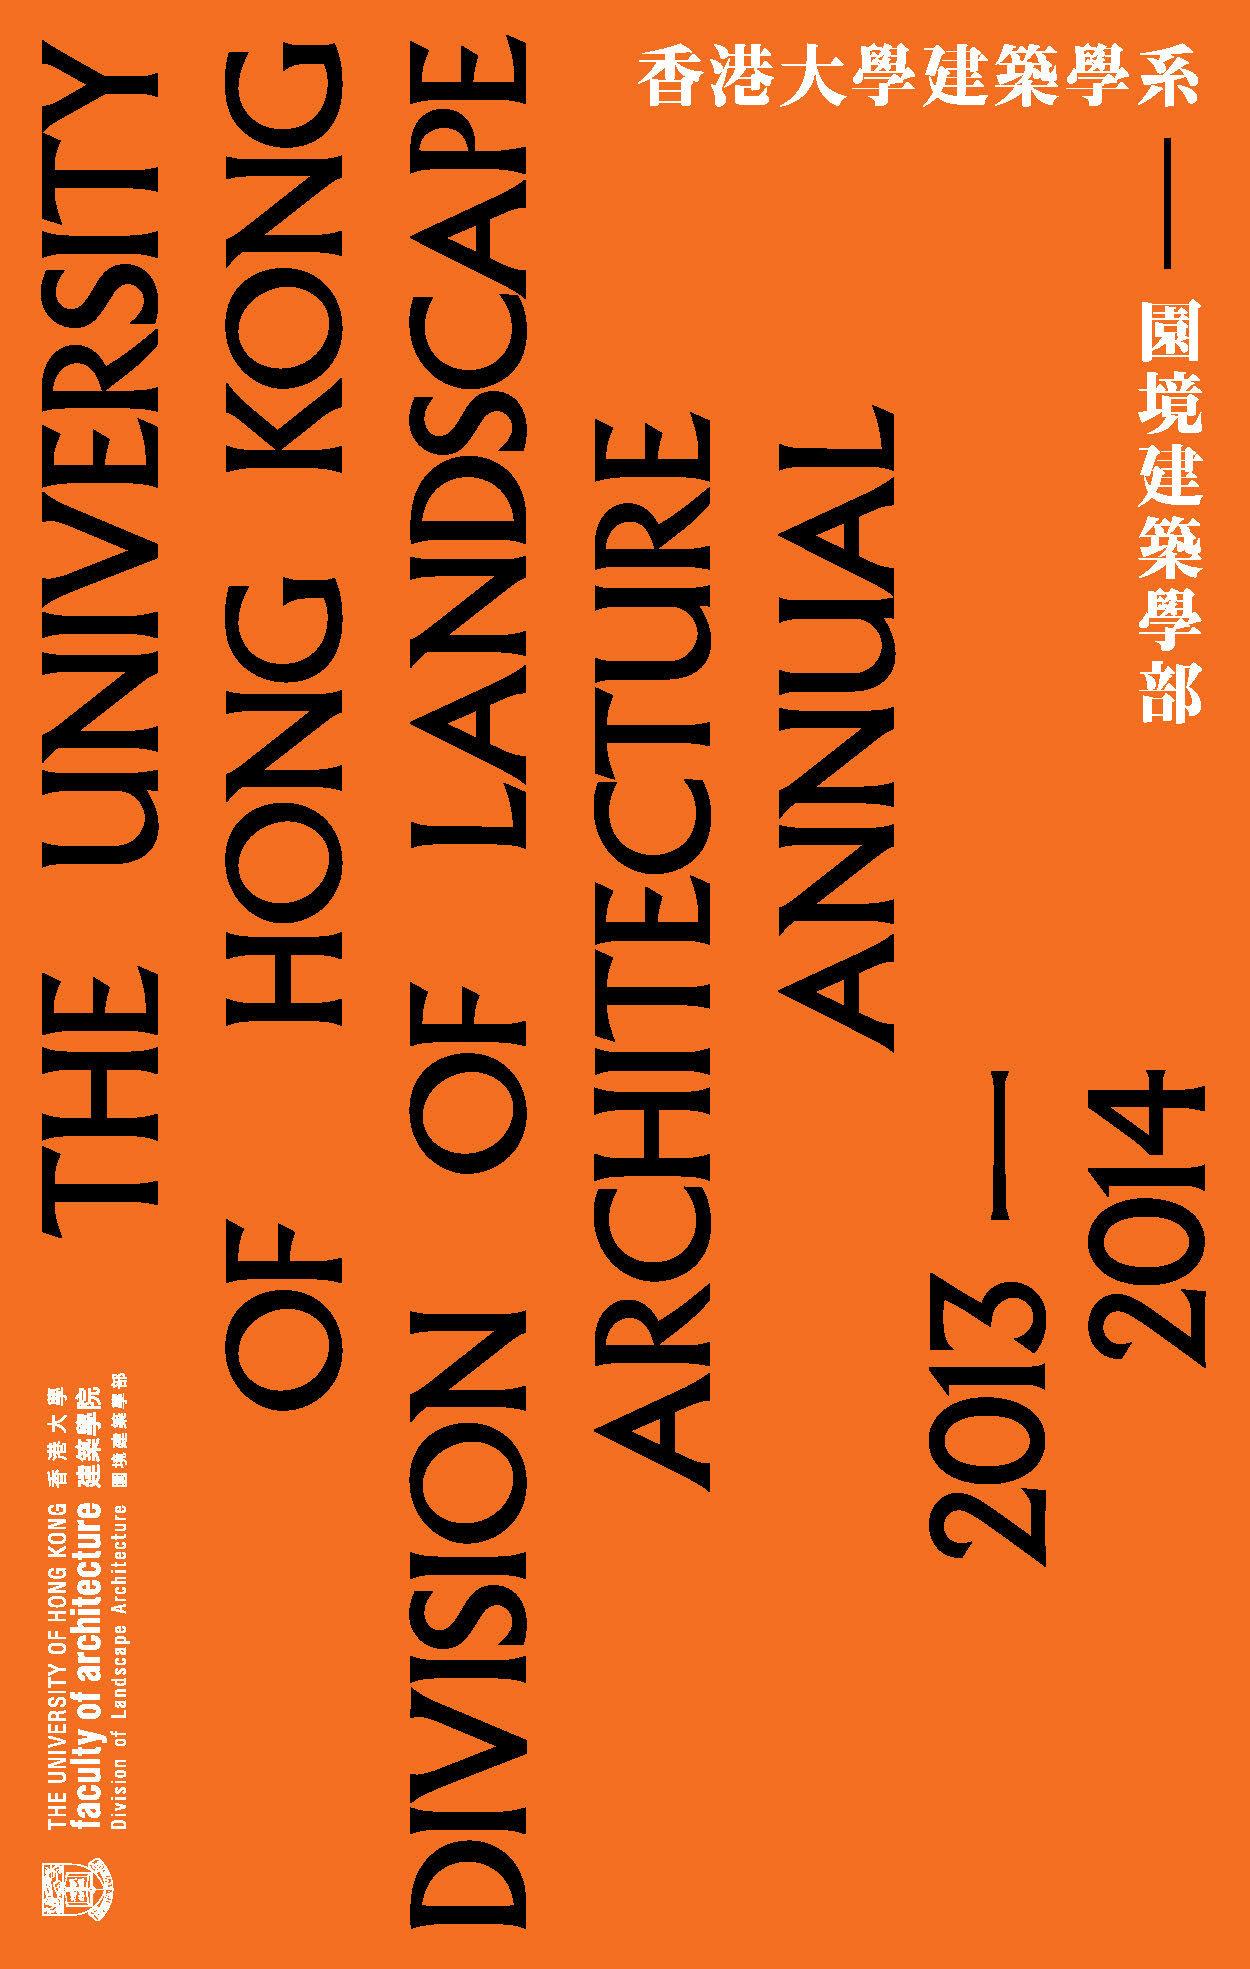 DLA Annual 2013-14 cover